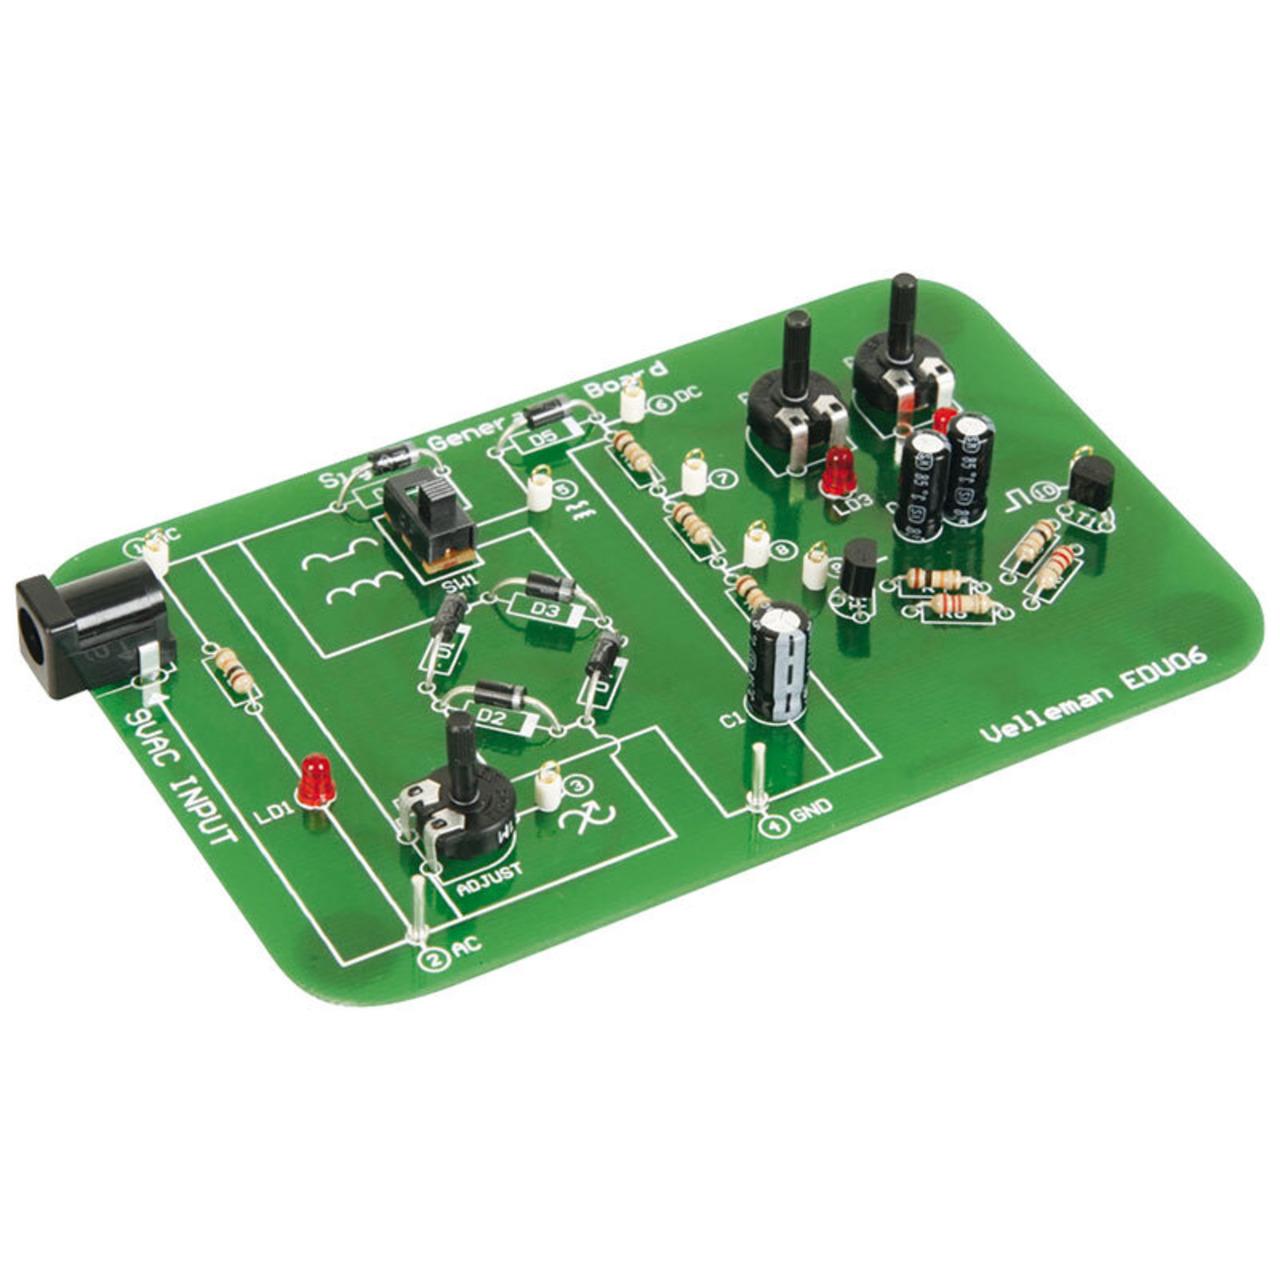 Velleman Bausatz Oszilloskop-Lernpaket EDU06